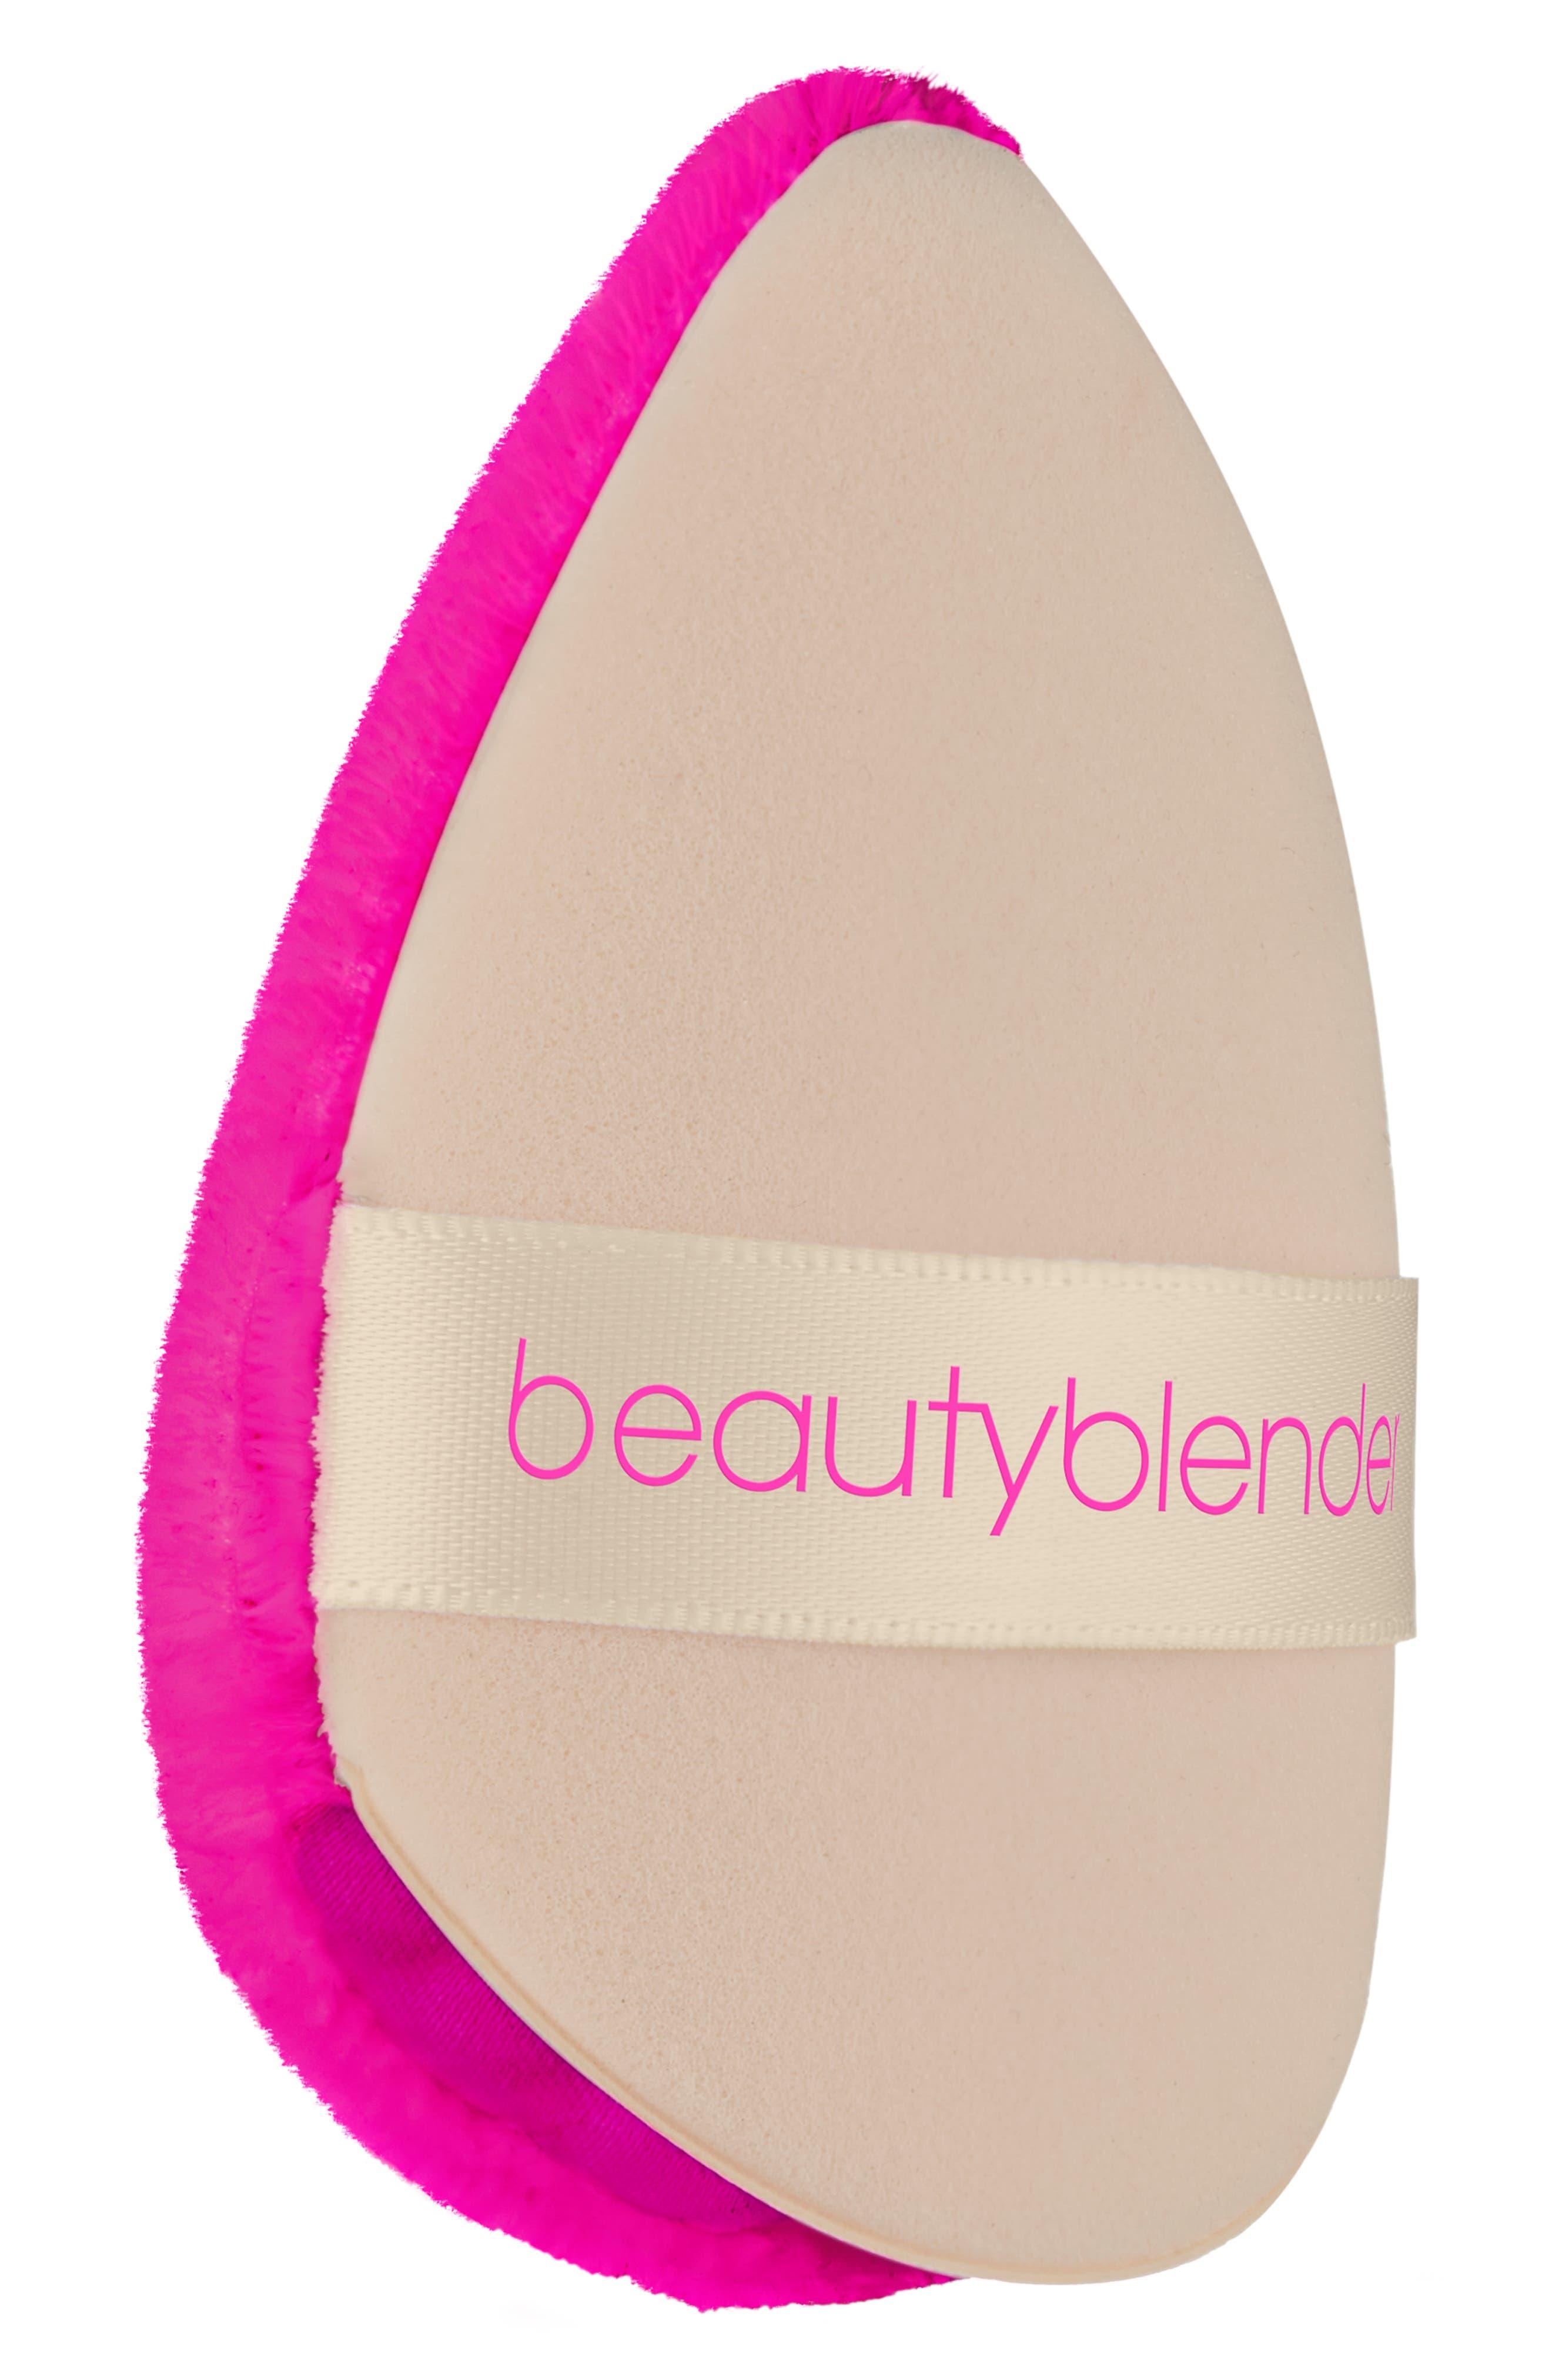 Beautyblender BEAUTYBLENDER POCKET PUFF(TM) DUAL-SIDED POWDER PUFF